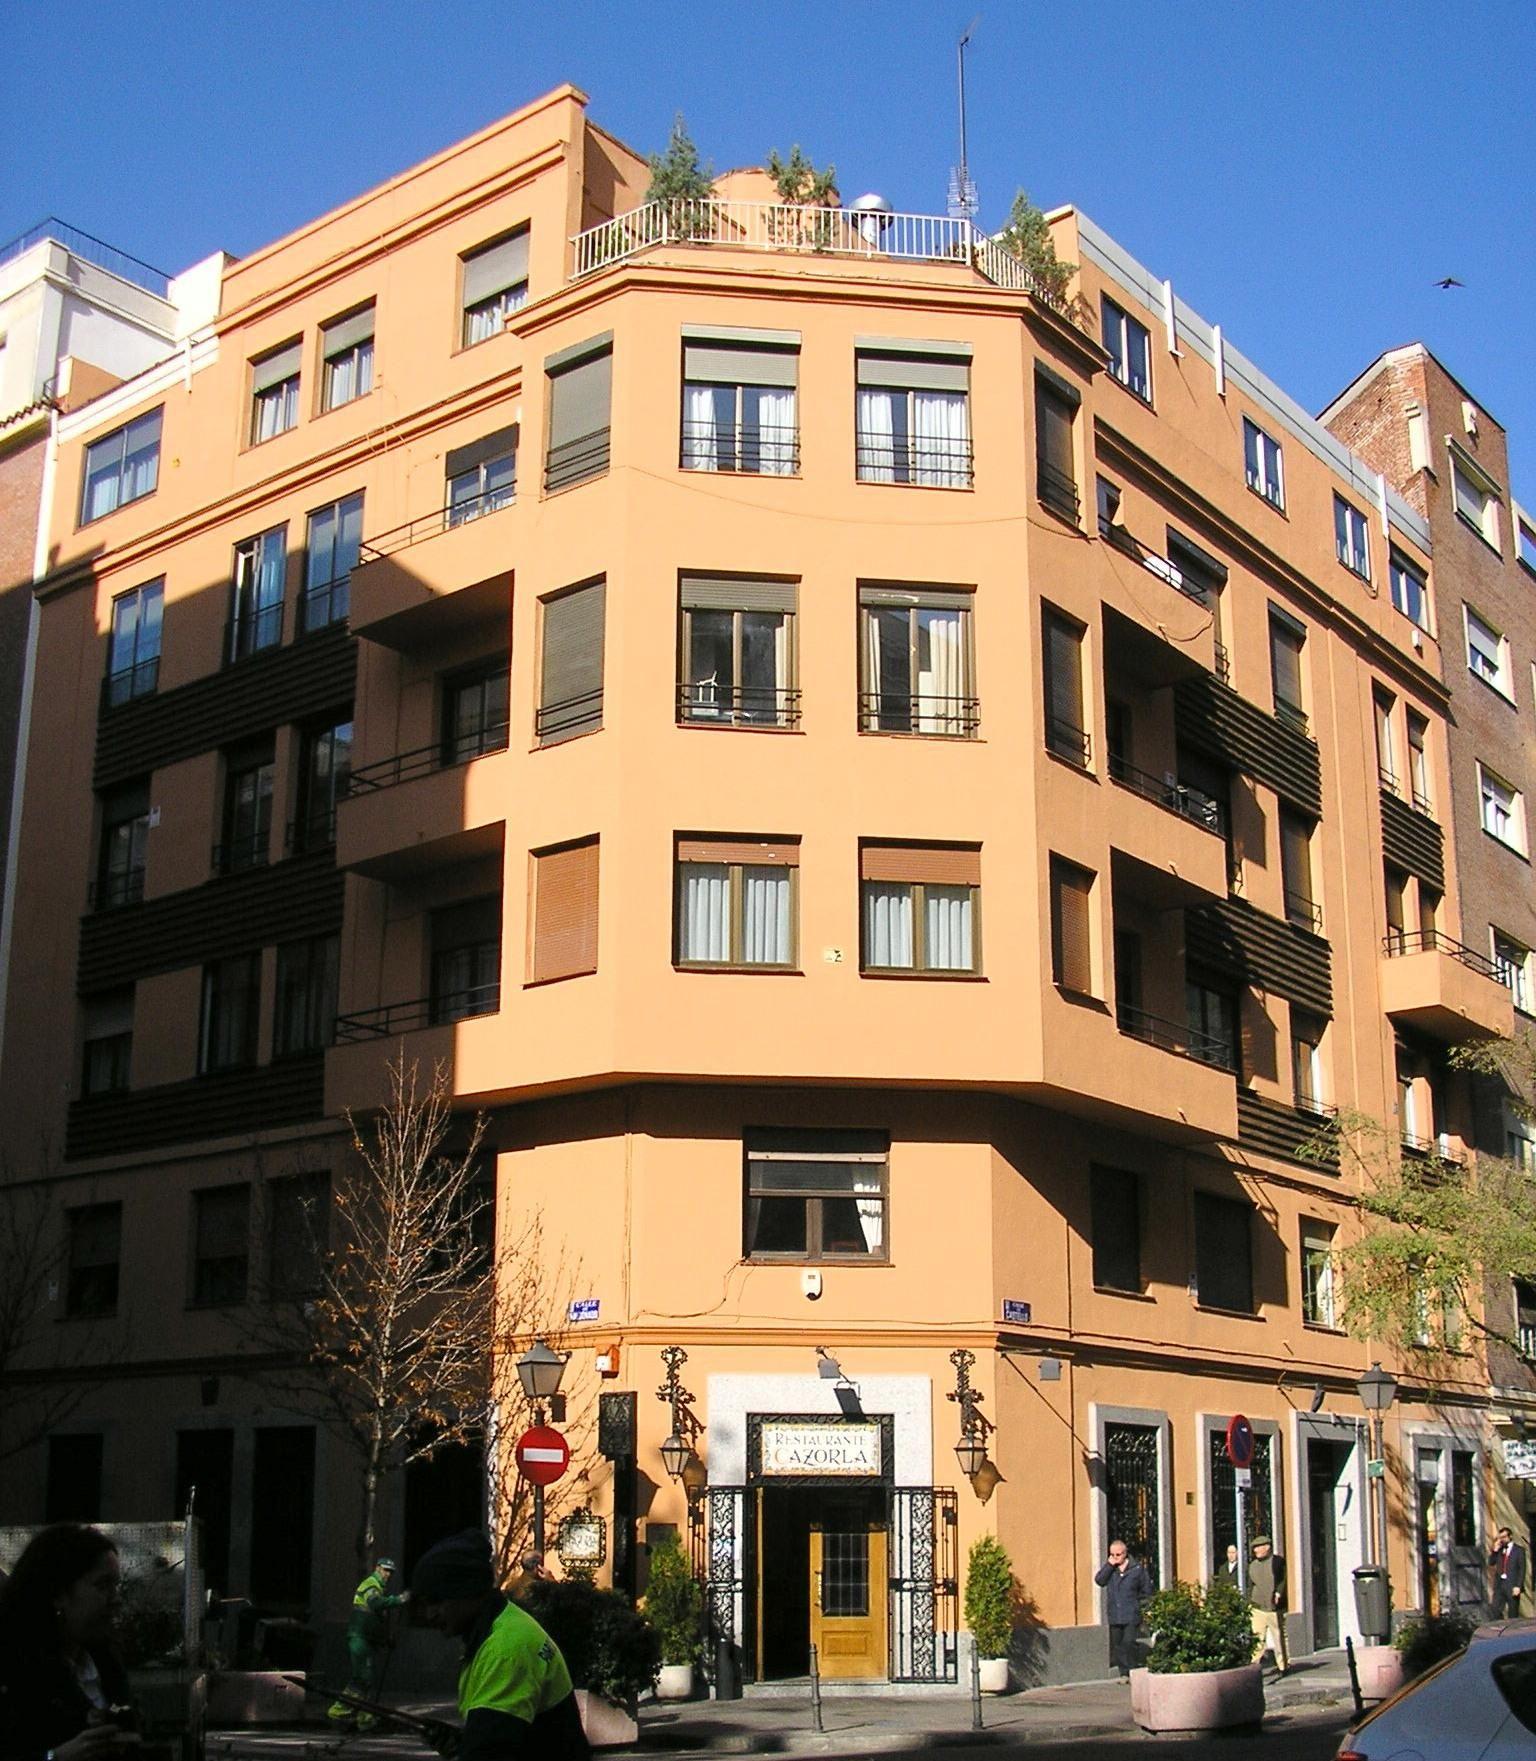 Edificios madrid inspeccin tcnica de edificios madrid de for Edificio de la comunidad de madrid